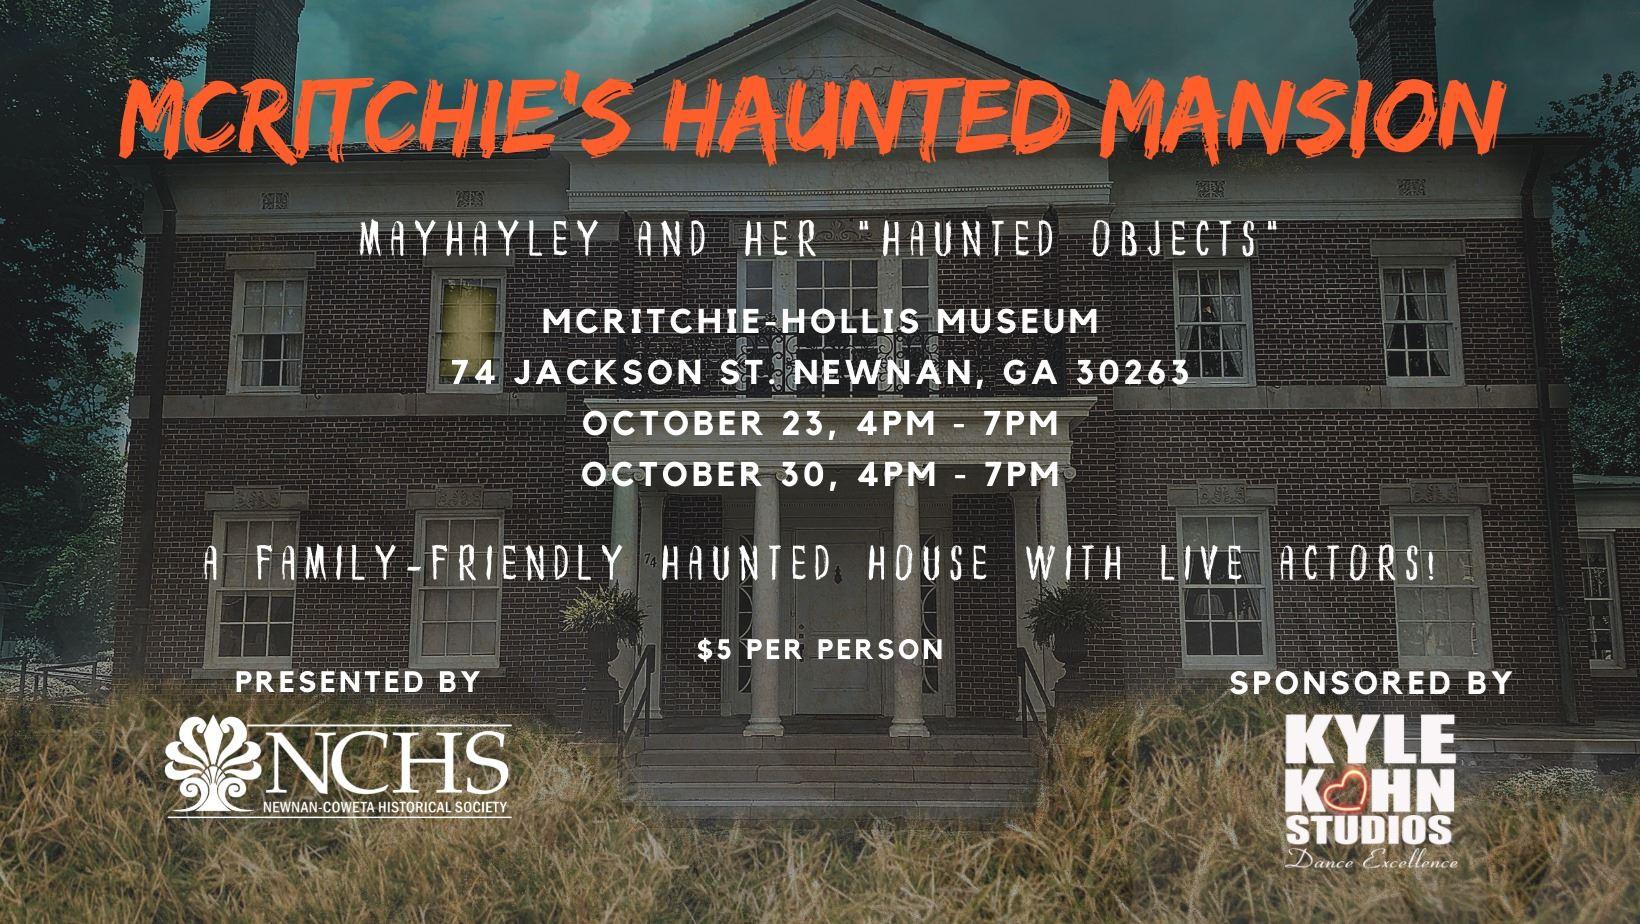 McRitchie's Haunted Mansion